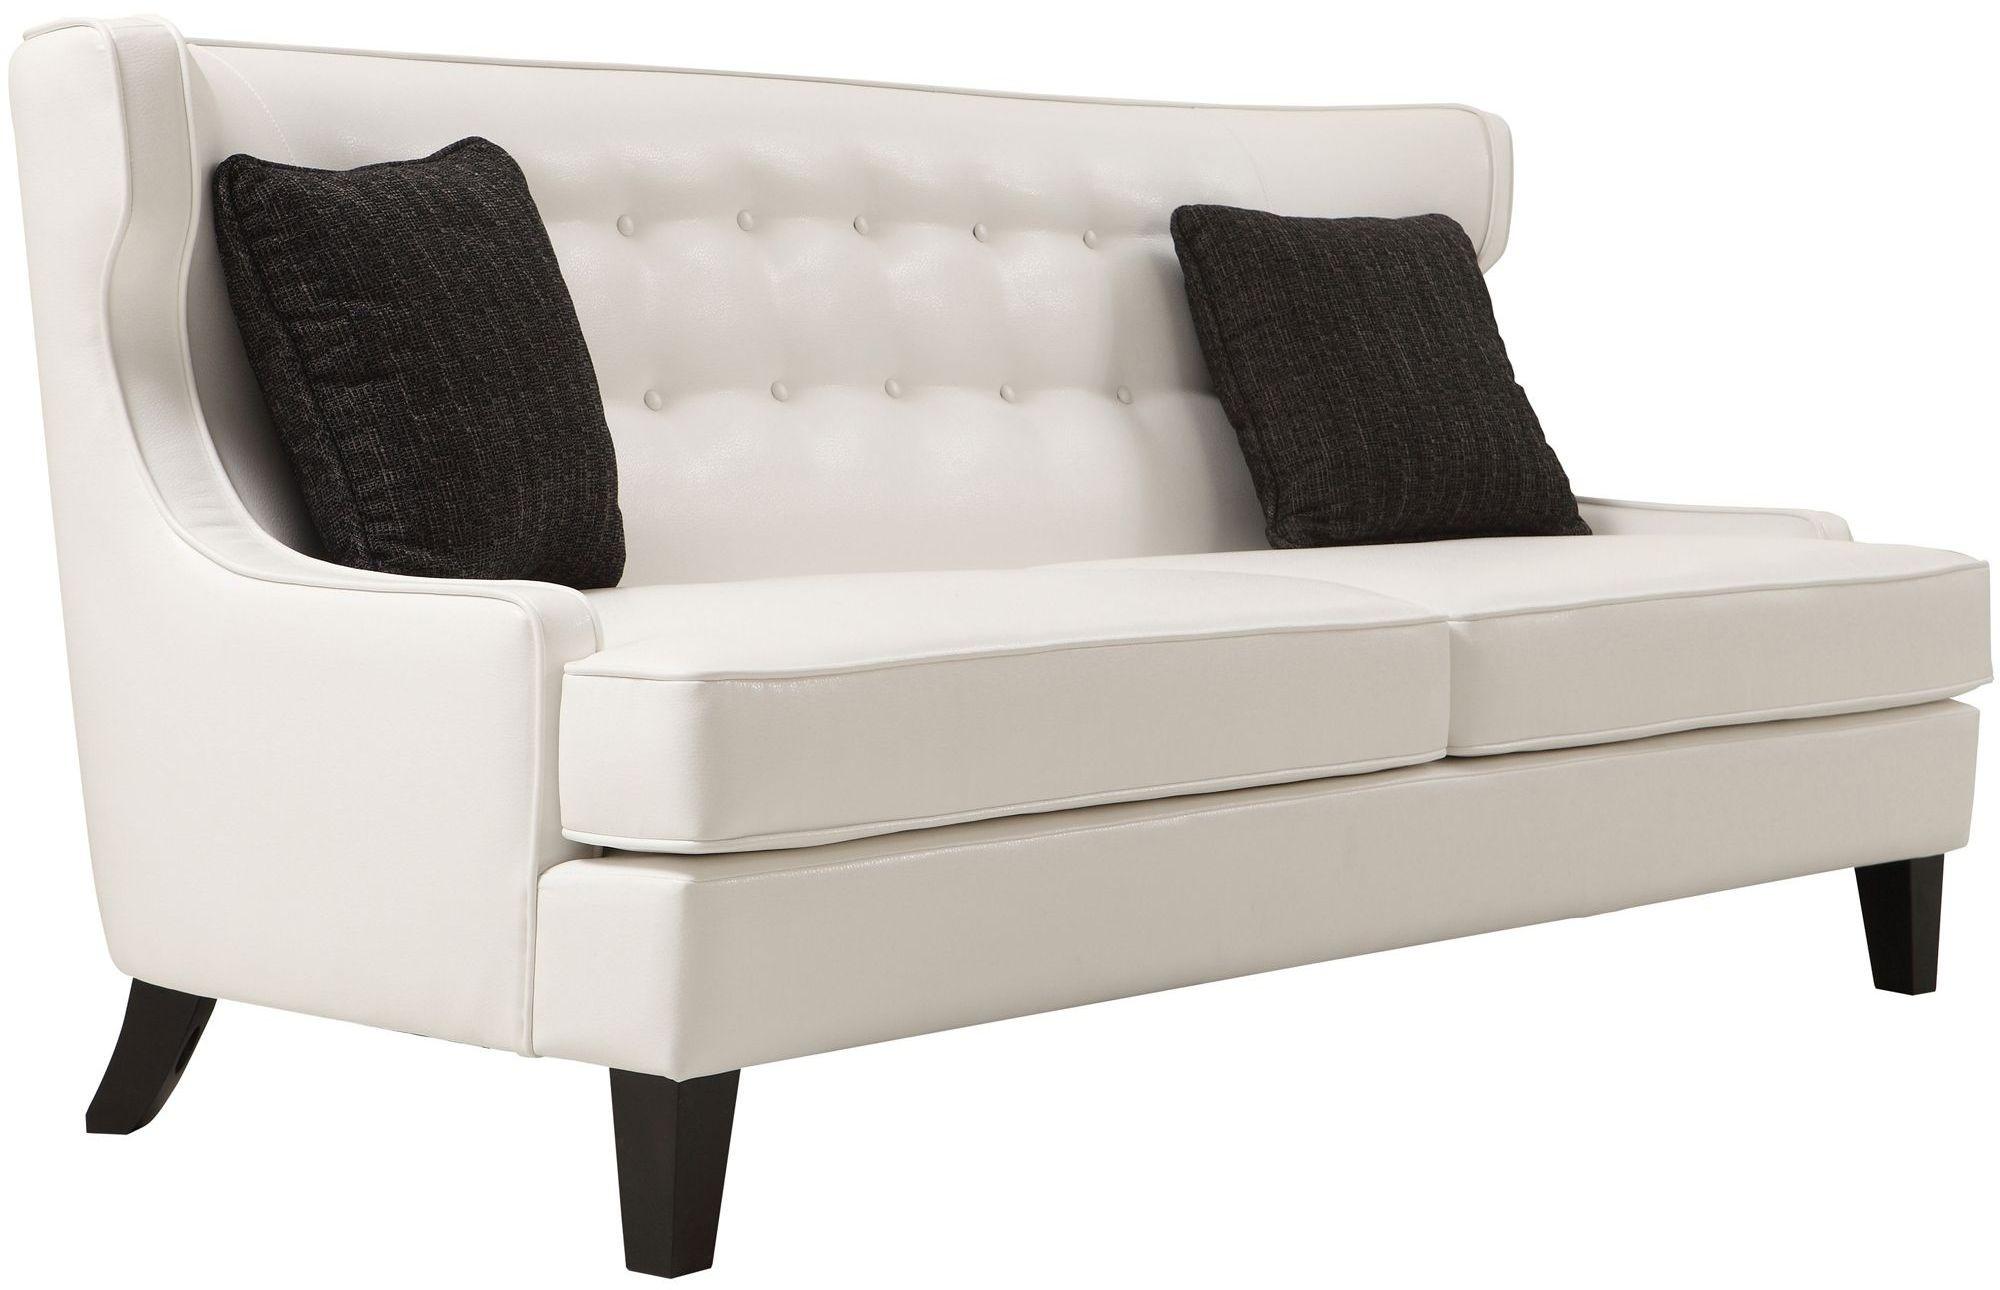 white bonded leather sectional sofa set with light blue ticking slipcover skyline from armen living